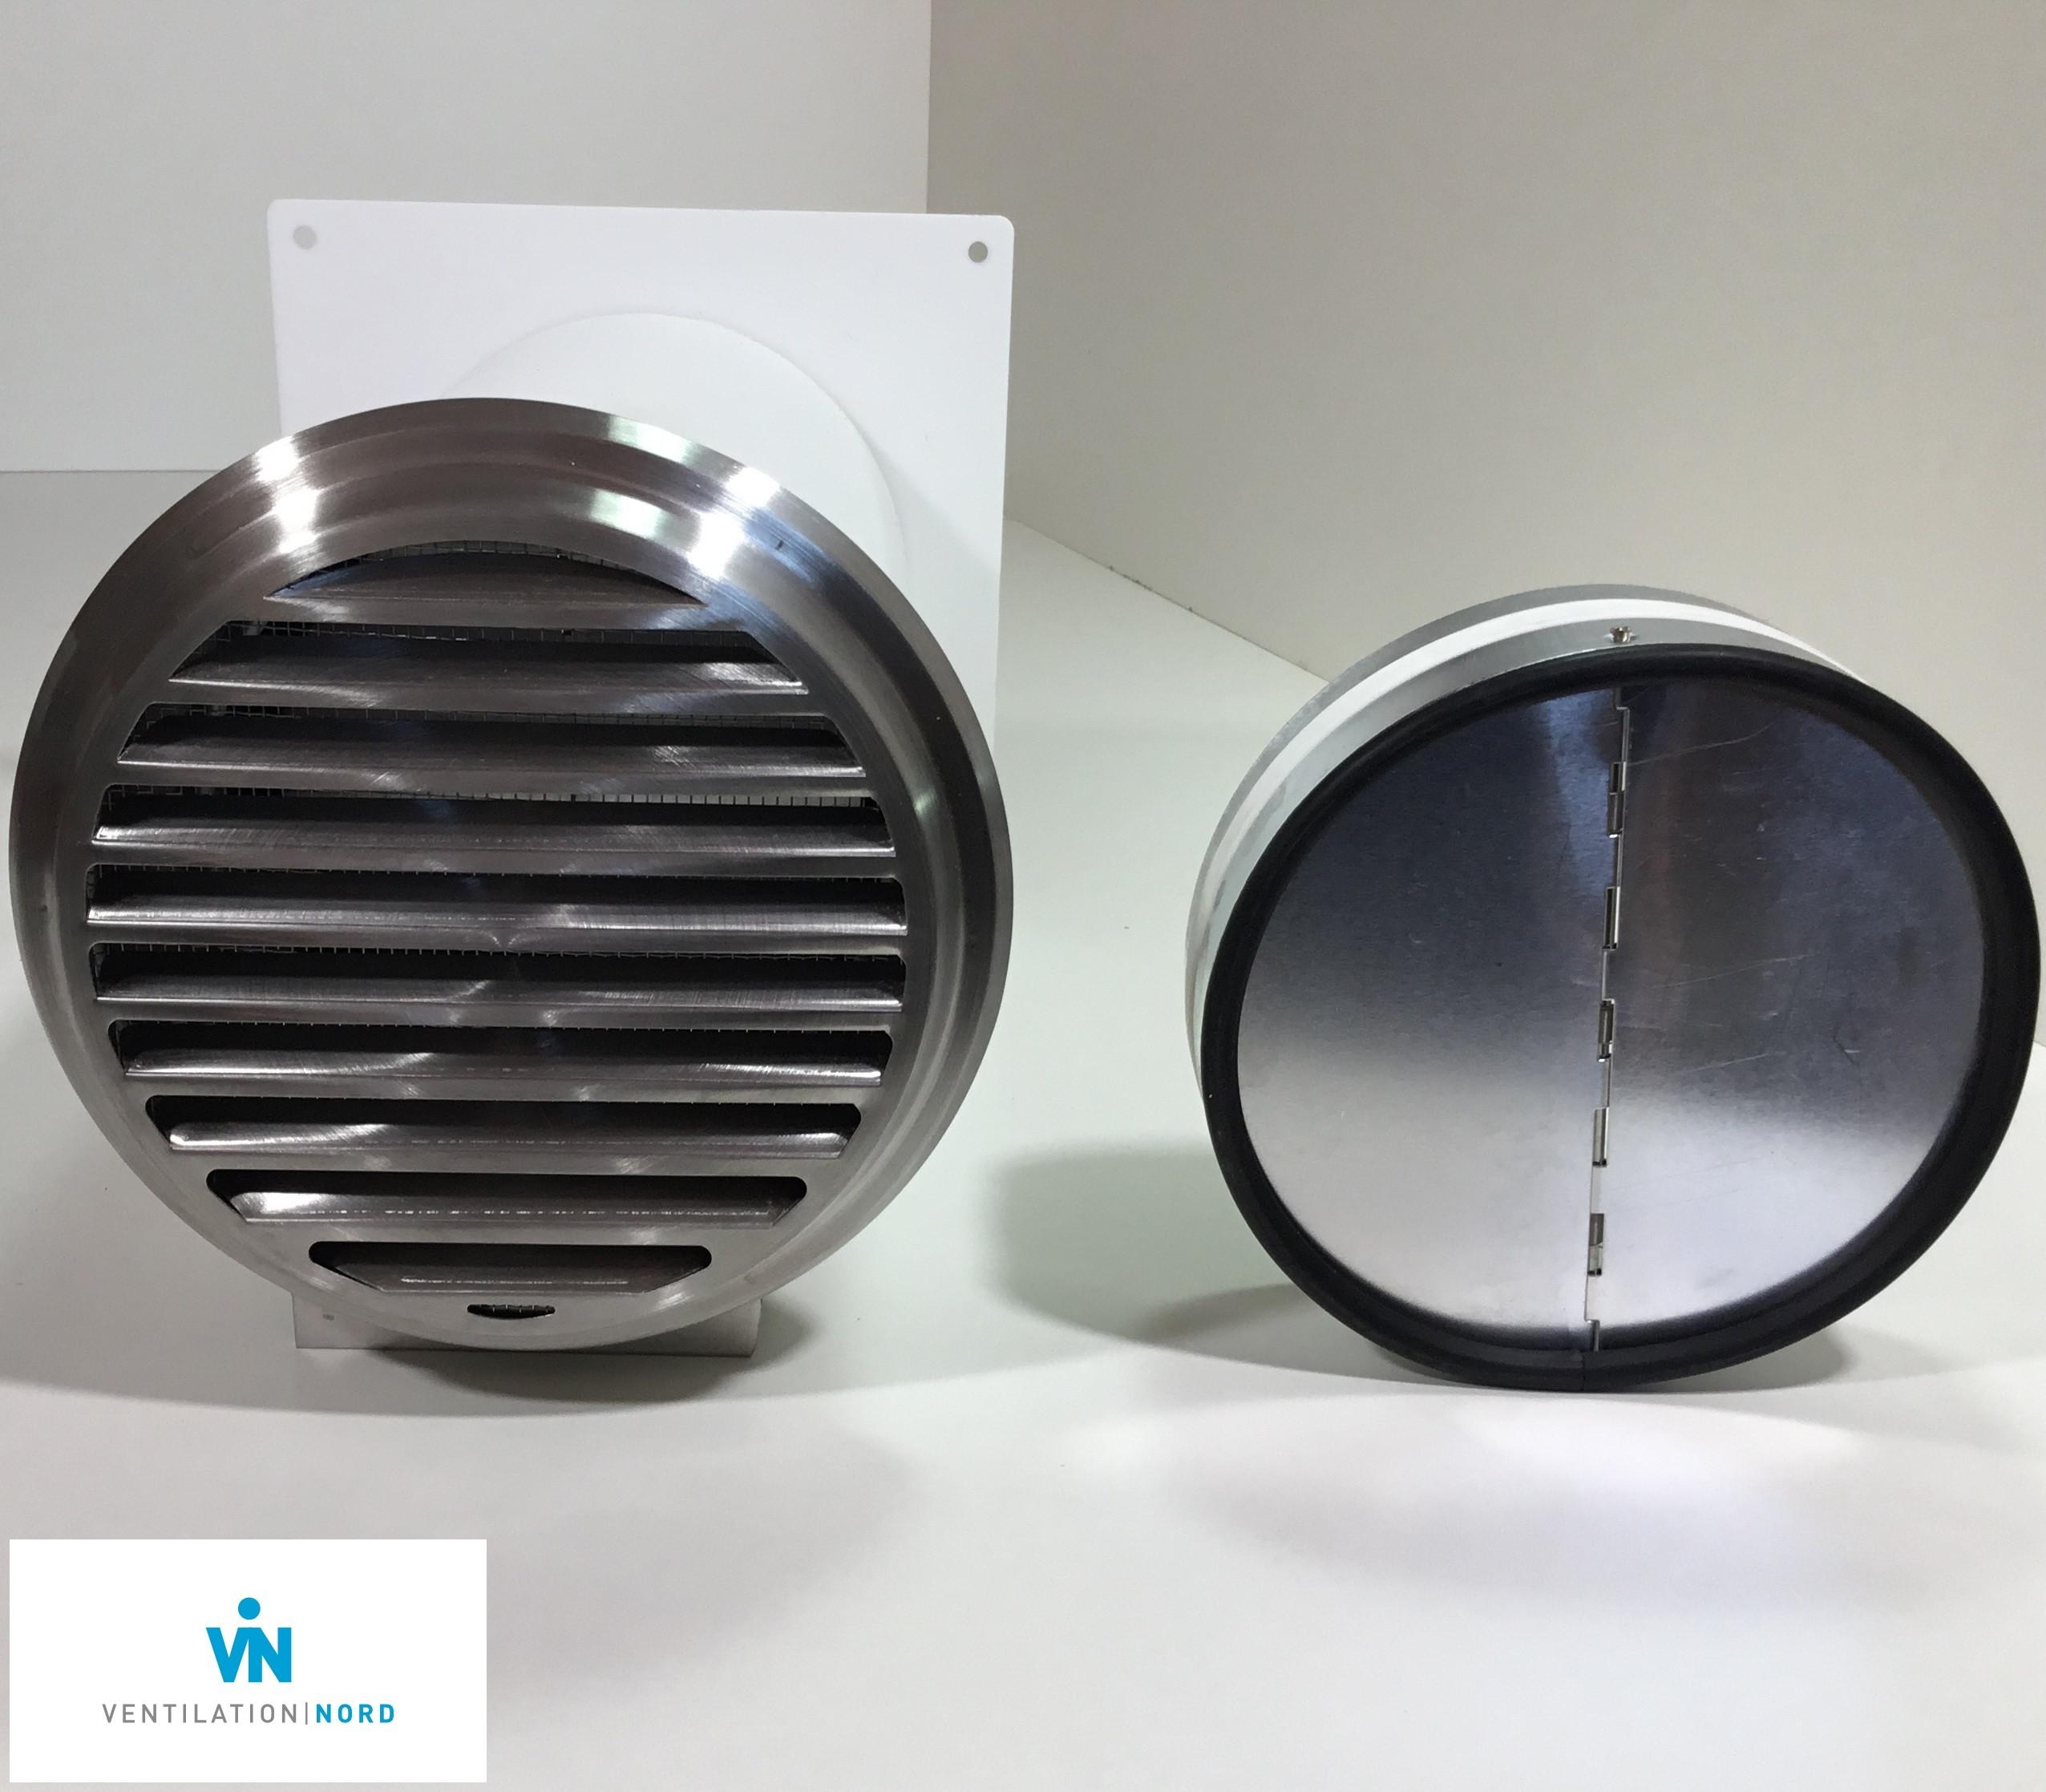 MKWSRLE-VentilationNord-Mauerkasten Dunstabzug 100 125 150 Edelstahl Insektenschutzgitter Rückstauklappe